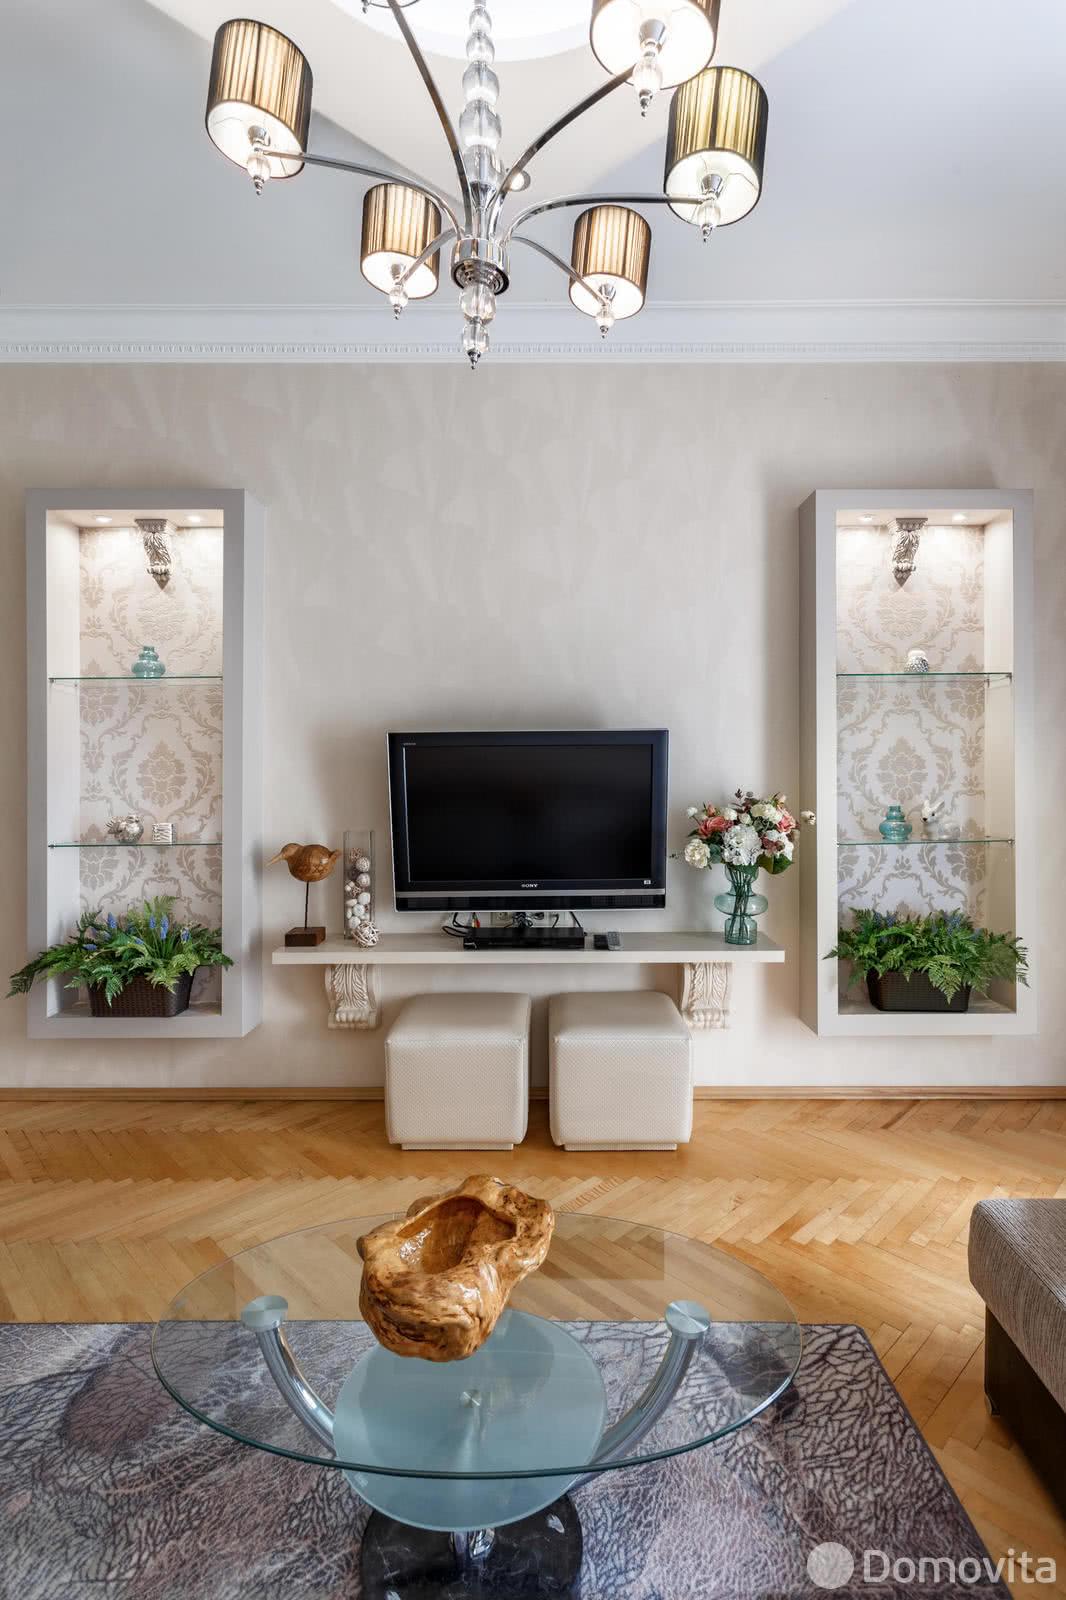 Аренда 2-комнатной квартиры на сутки в Минске ул. Красная, д. 18 - фото 3